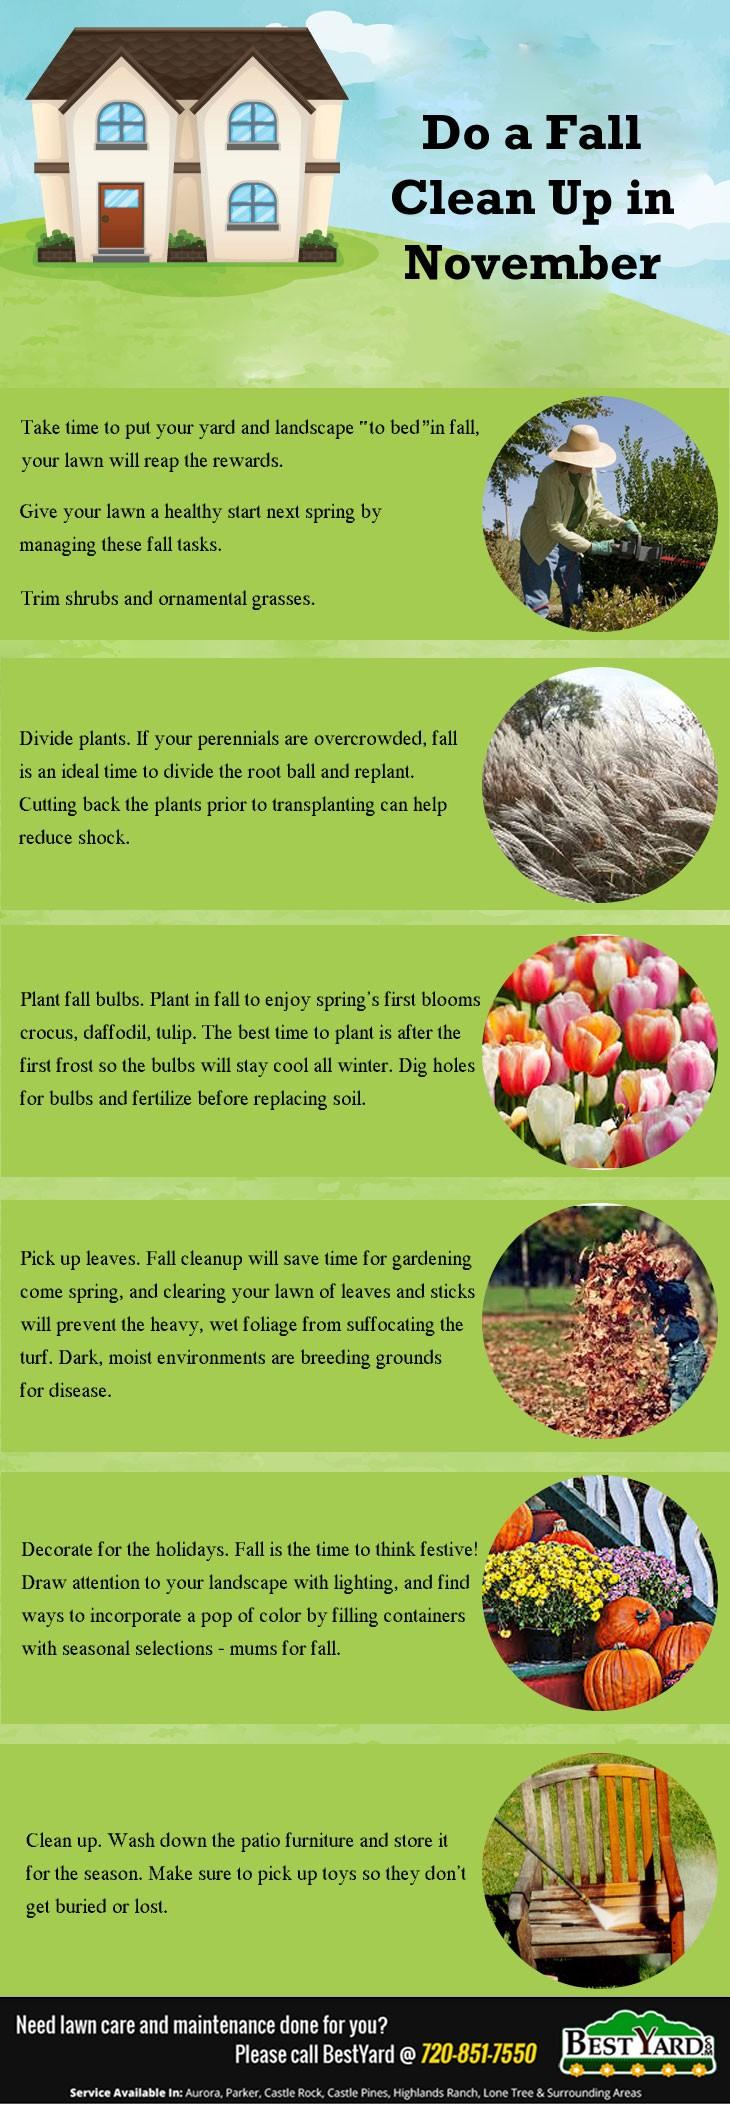 Do A Fall Clean - Up in November - bestyard.com